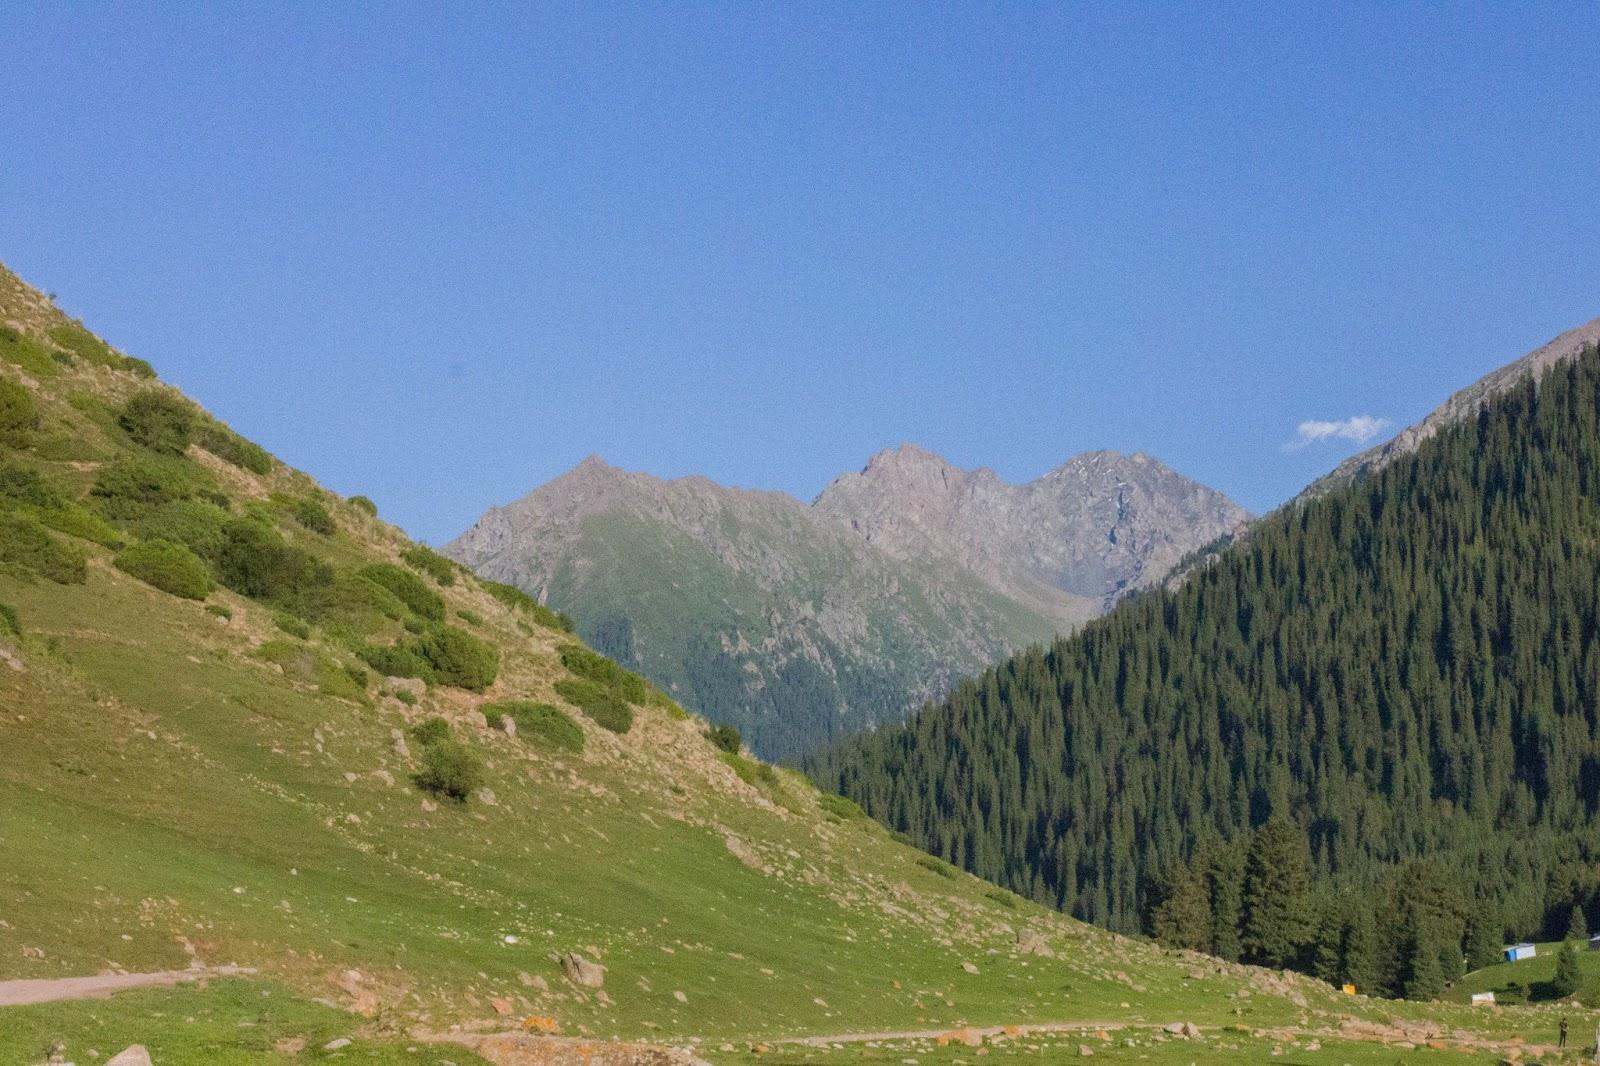 Кыргызстан, Джеты-Огуз, Иссык-Куль, горы